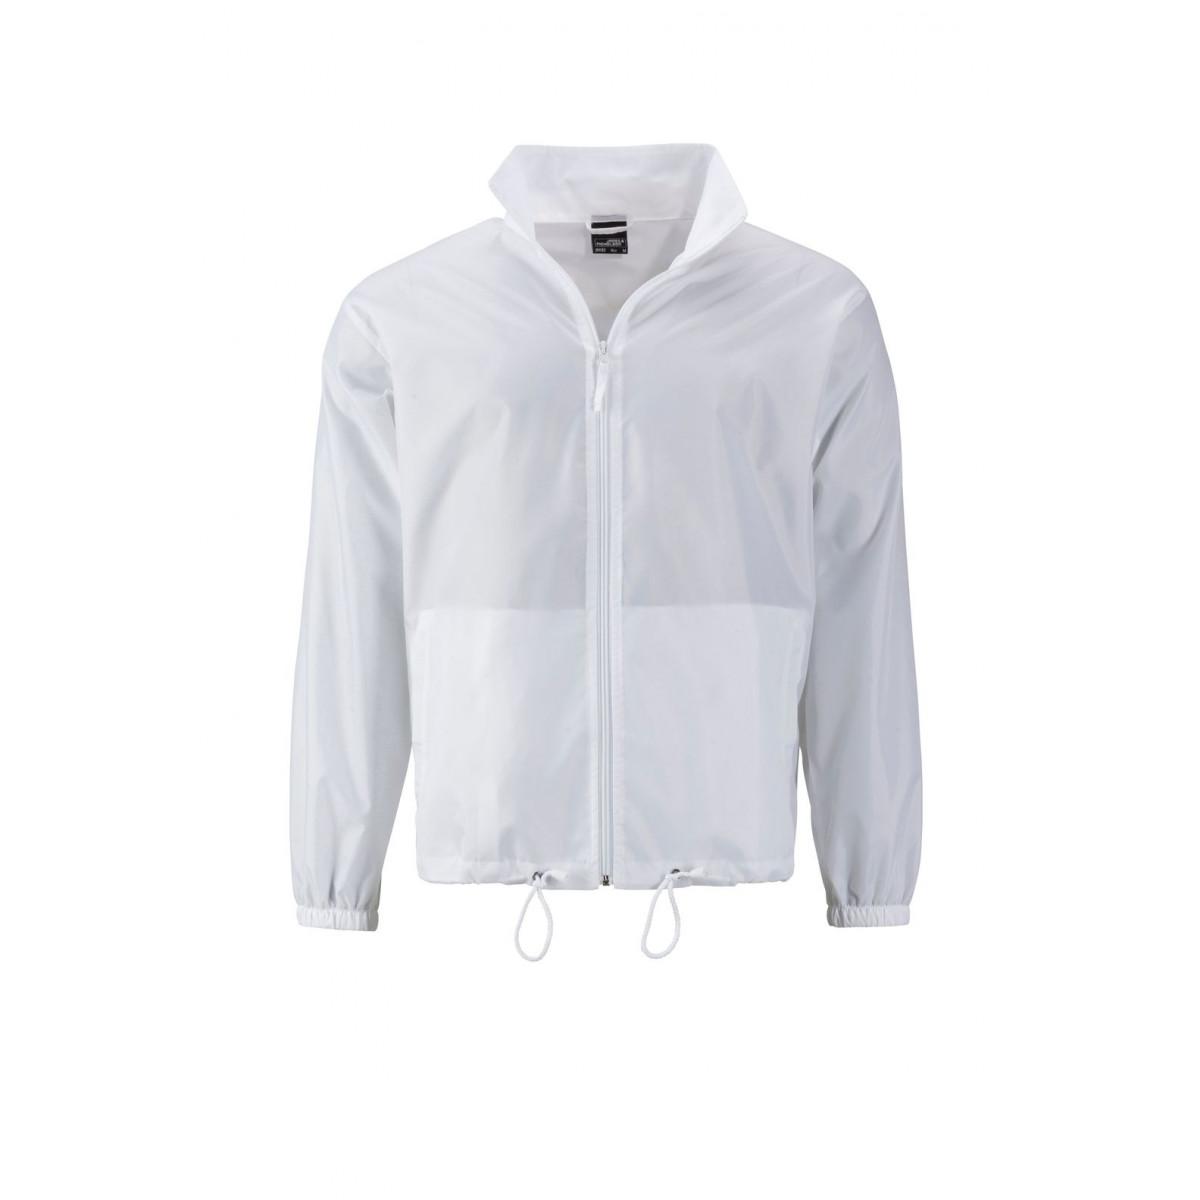 Куртка мужская JN1132 Mens Promo Jacket - Белый